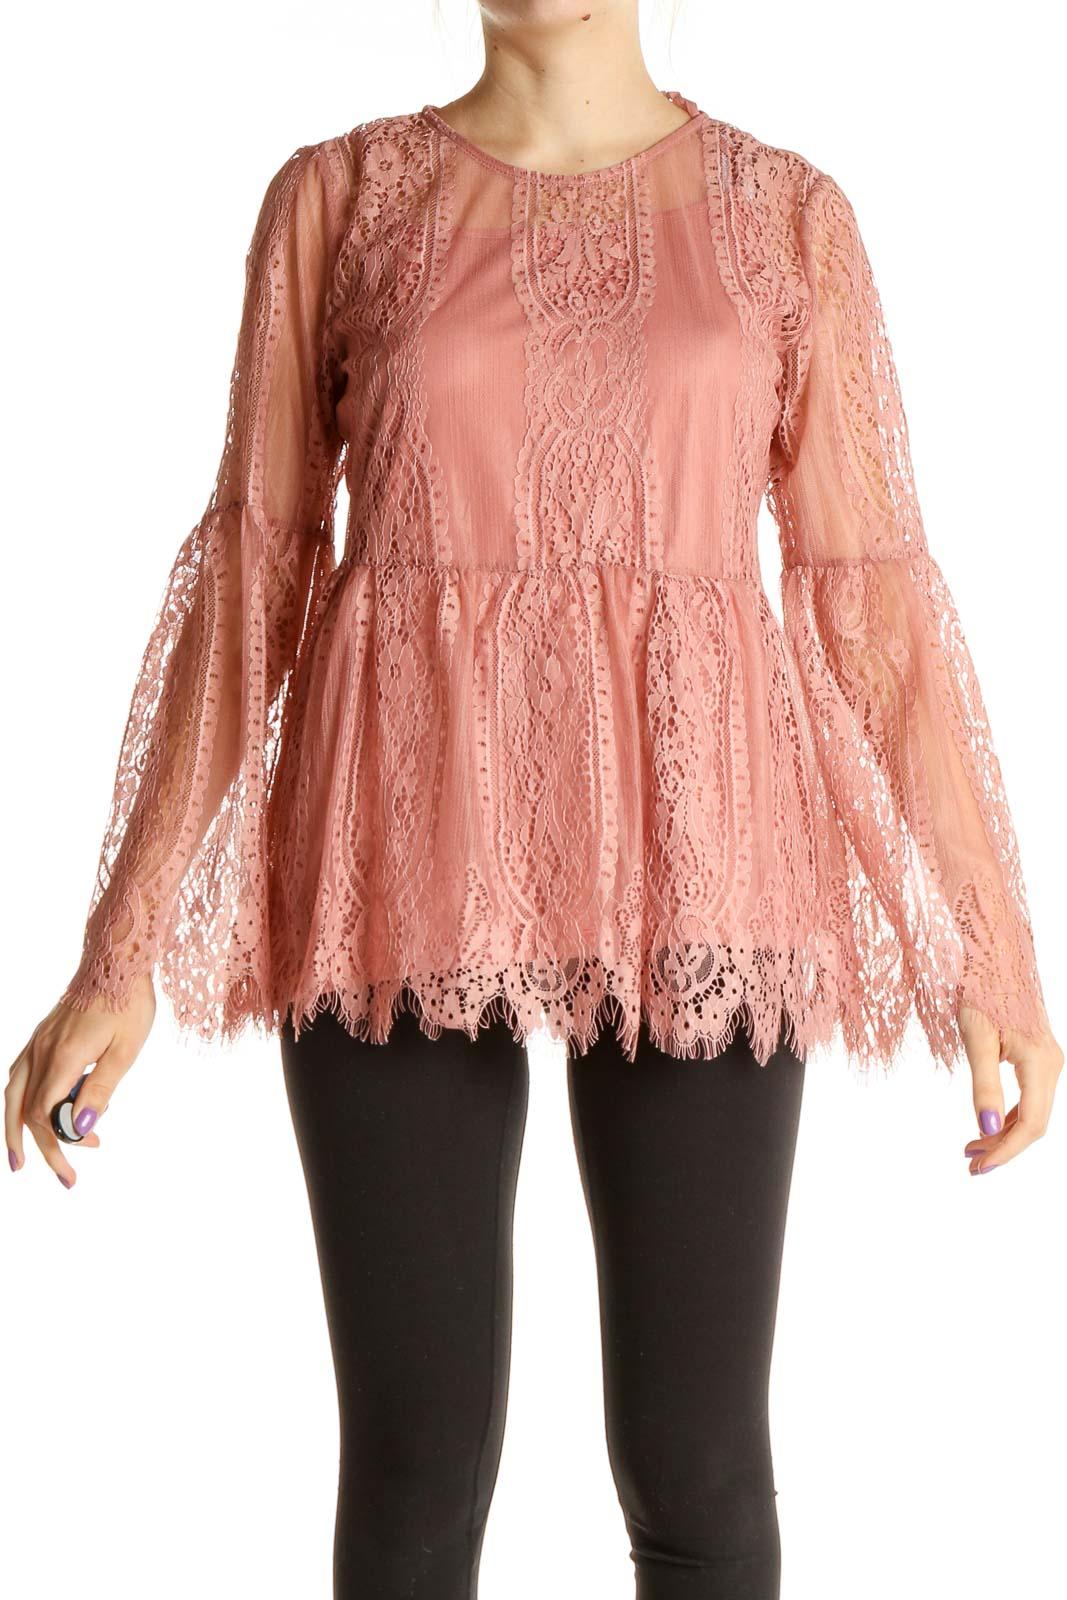 Pink Lace Bohemian Blouse Front